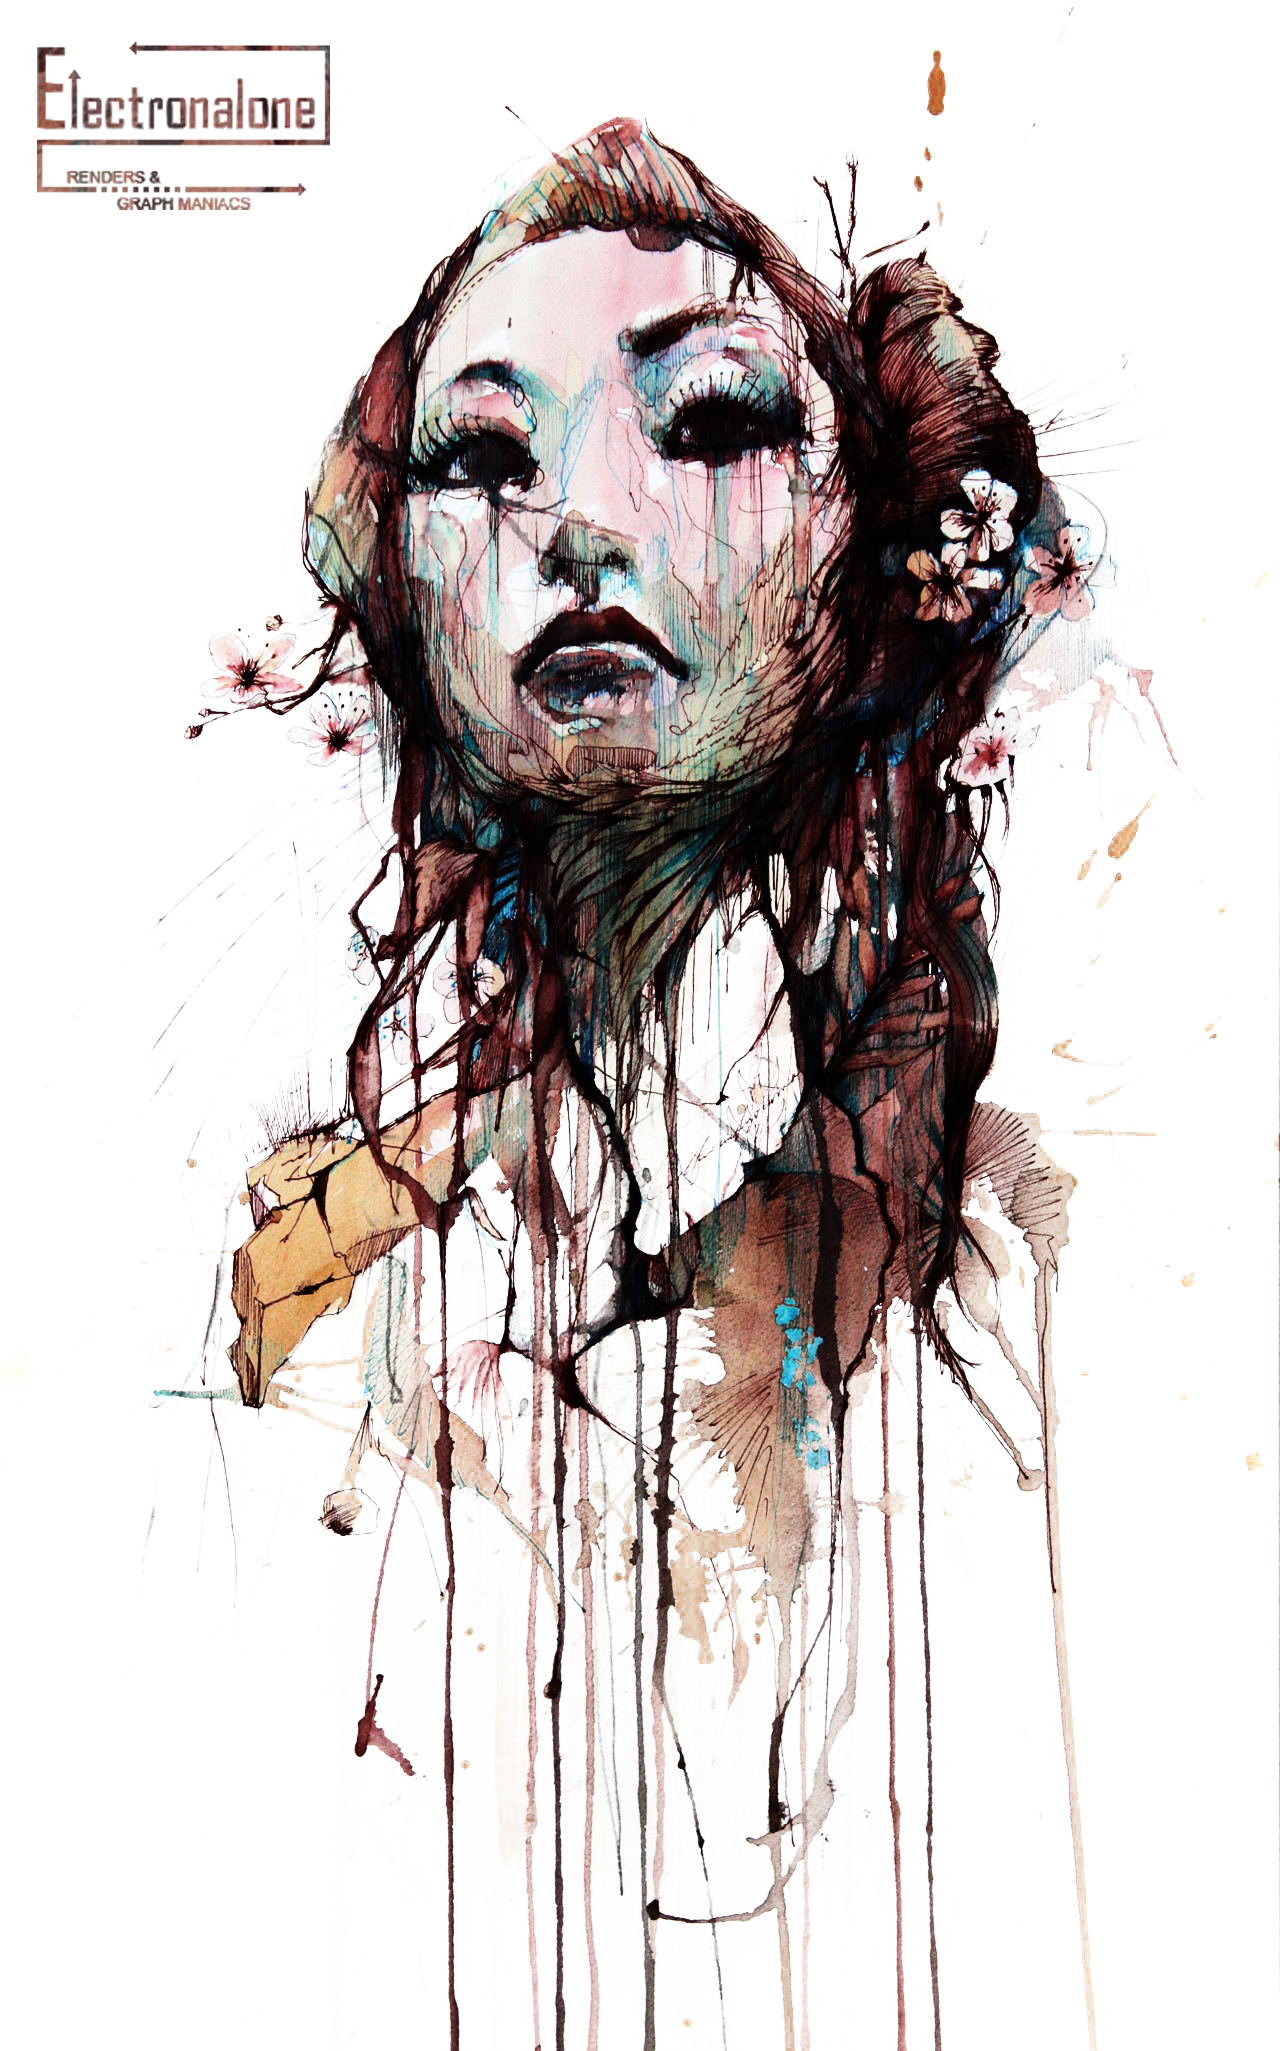 Render Filles/Femmes - Renders femme original fleur de cerisiers peinture  artiste plumes visage rouge - PNG Peintre Artiste